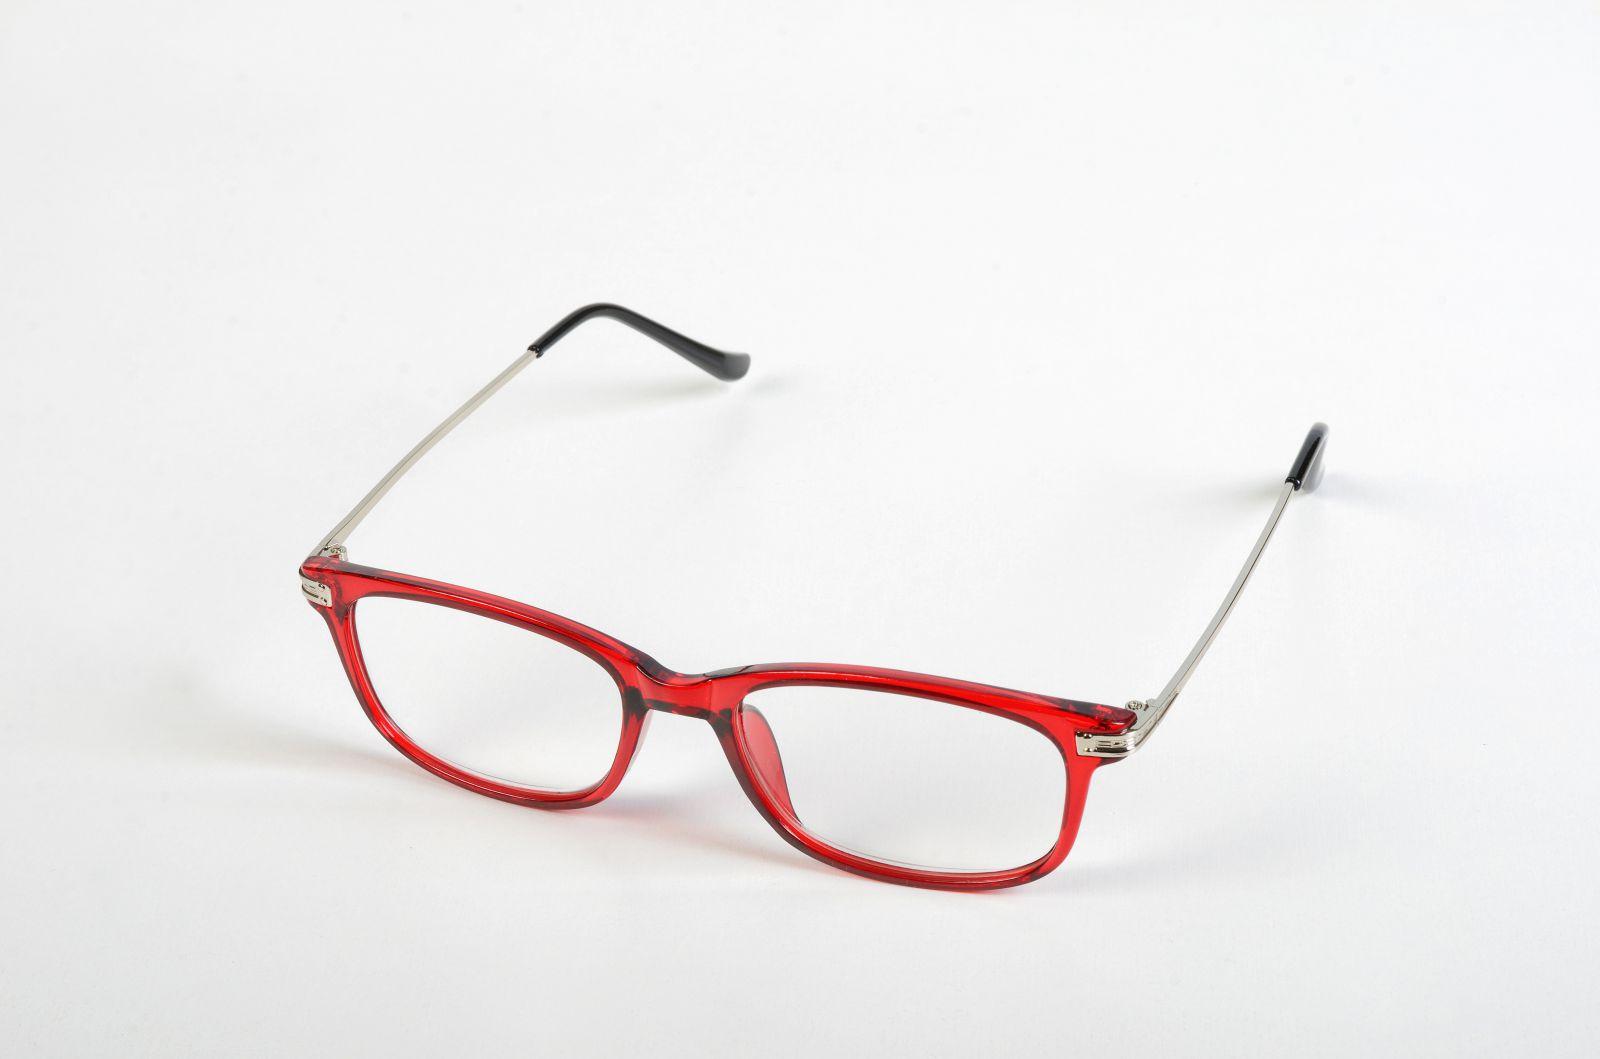 Dioptrické brýle 1807 +4,0